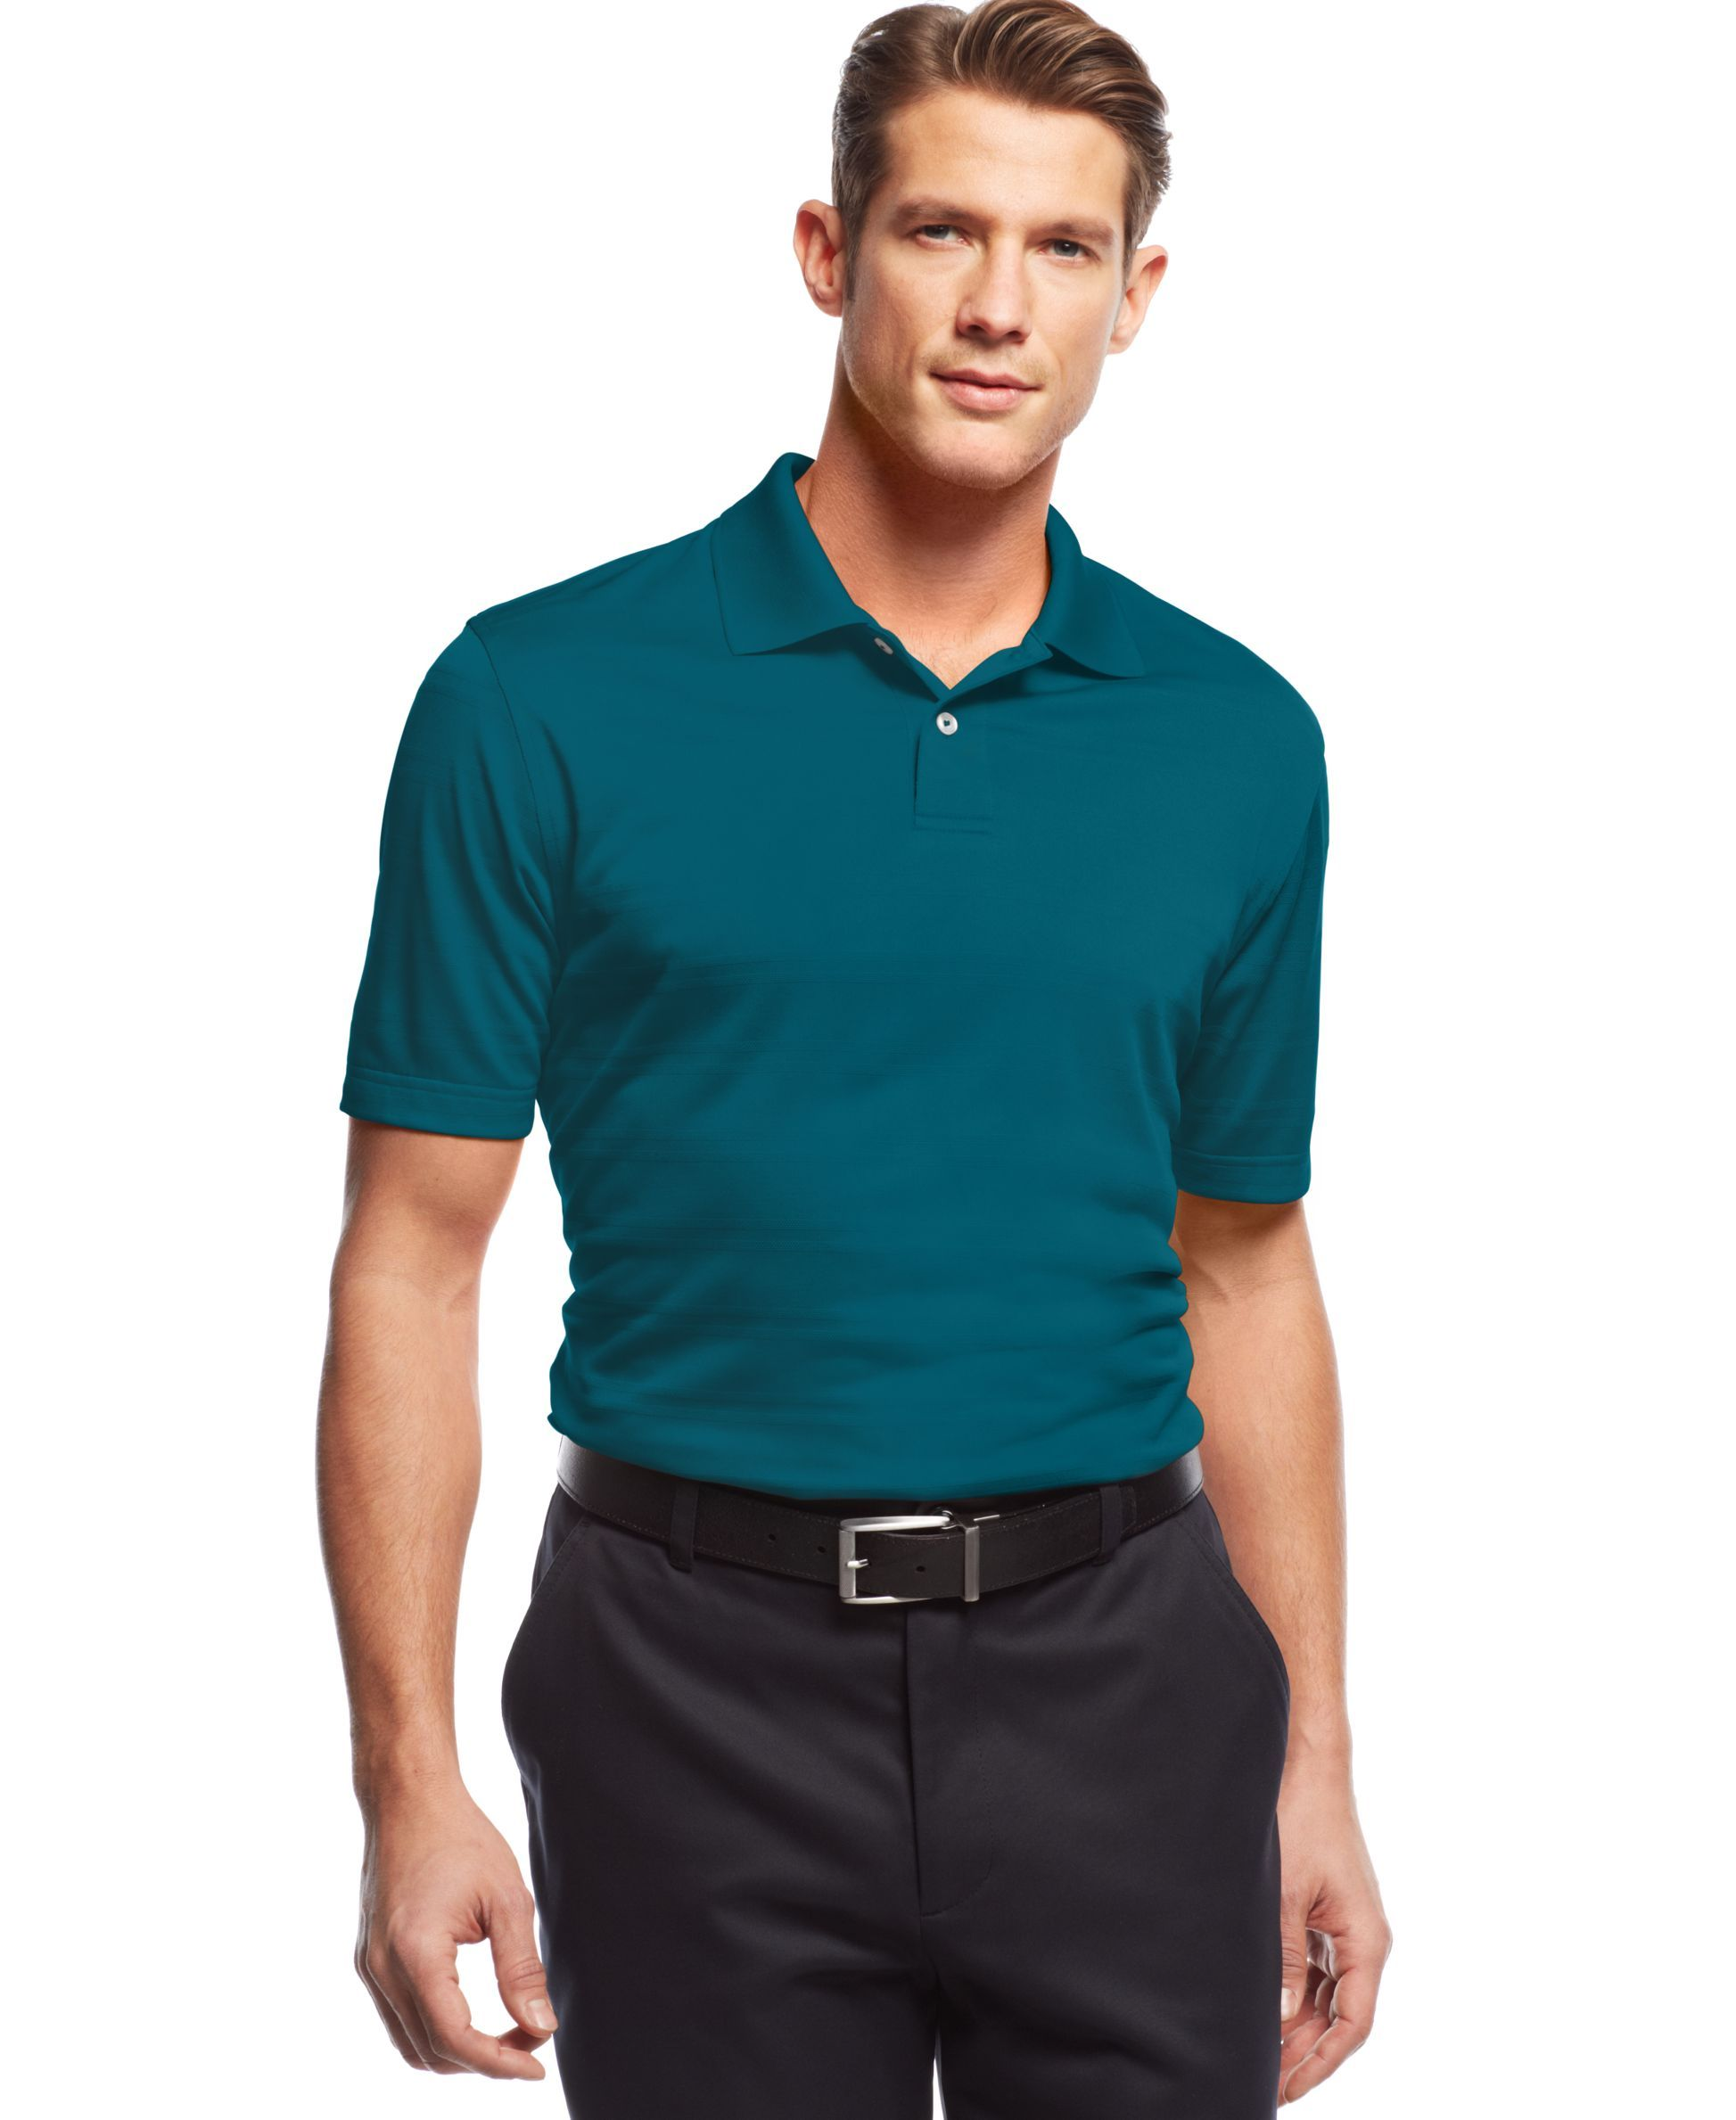 Cheap Polo Shirts Big And Tall Chad Crowley Productions